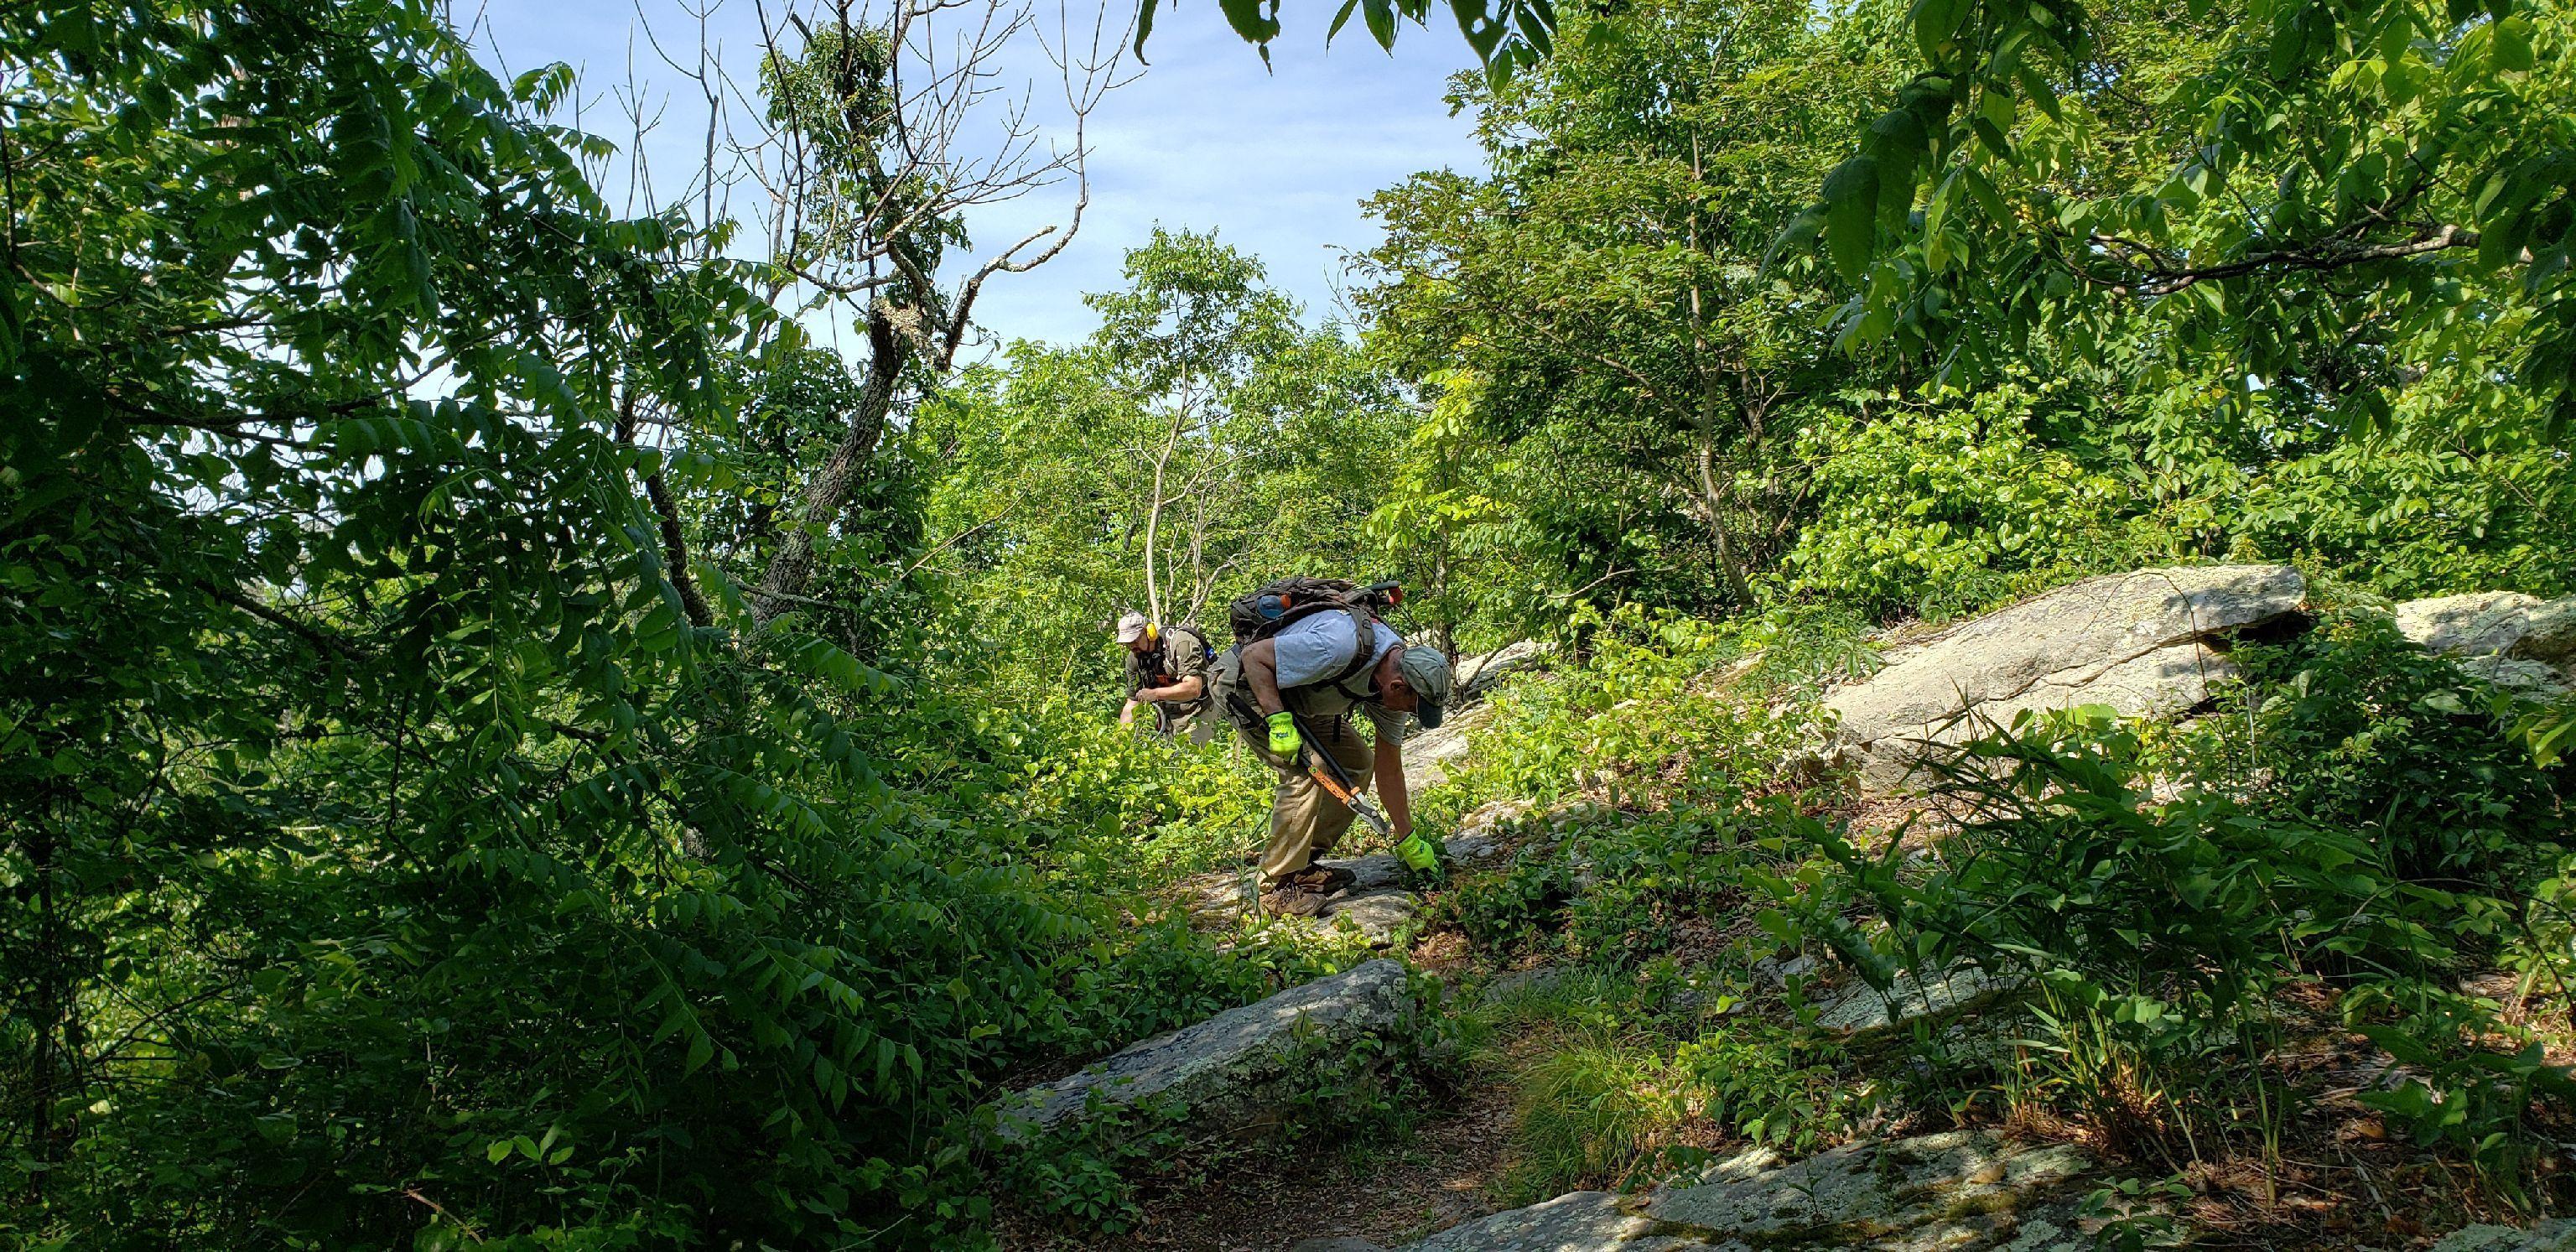 Roanoke Appalachian Trail Club Meetup Group